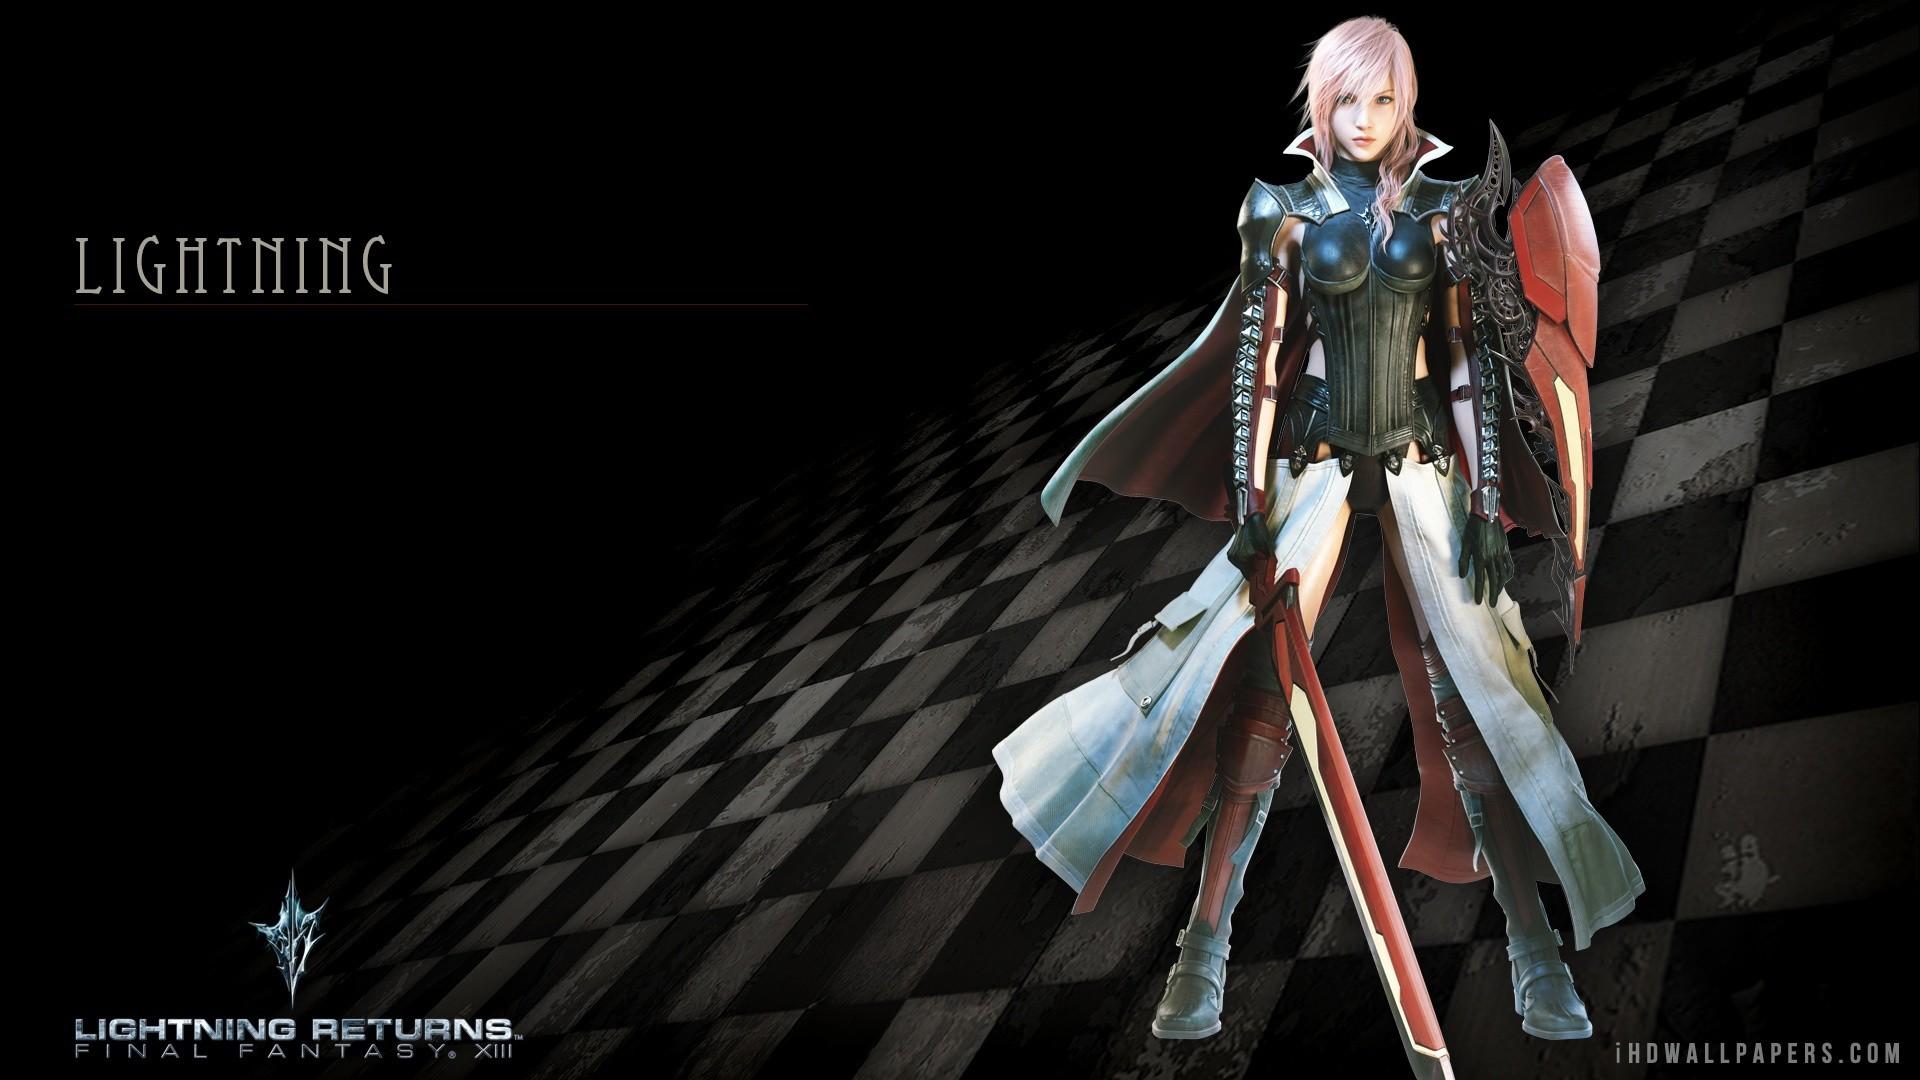 Lightning Returns Final Fantasy XIII HD Wallpaper – iHD Wallpapers